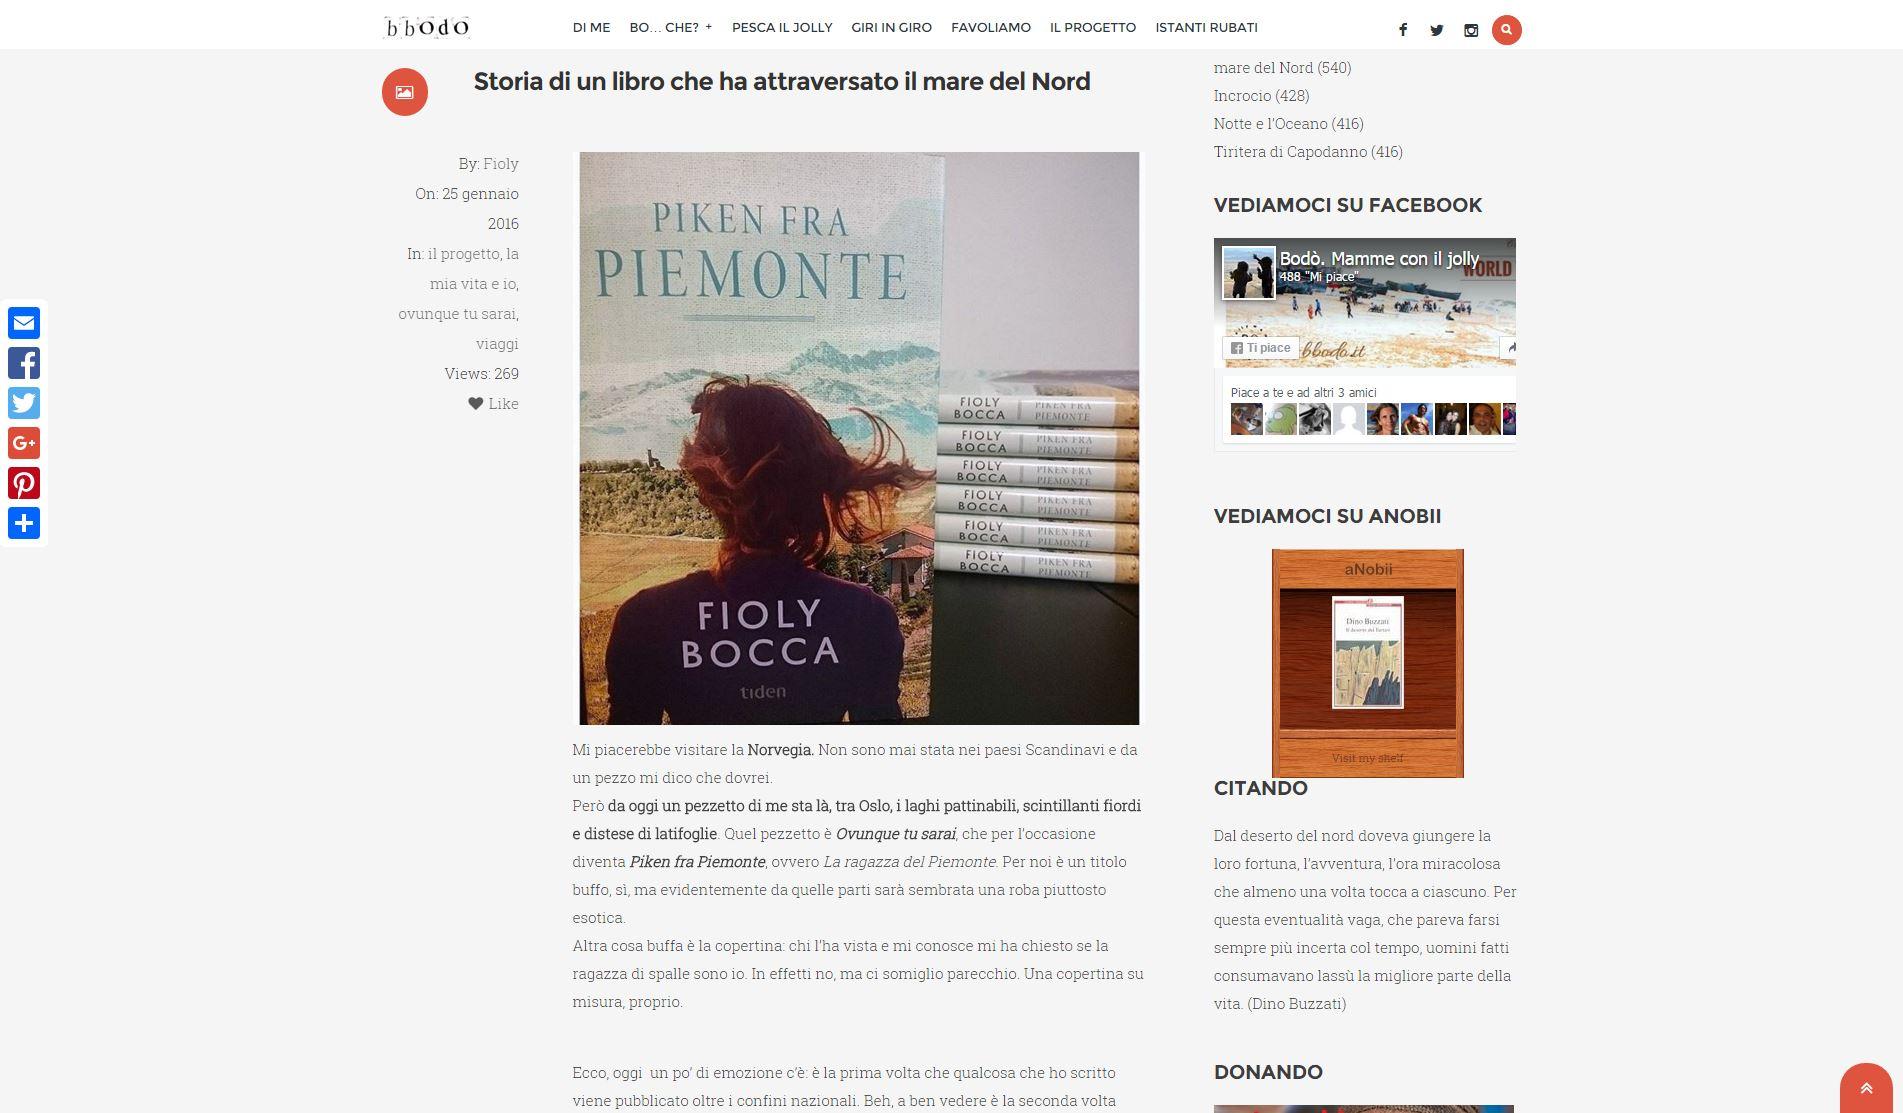 creazione blog wordpress fioly bocca